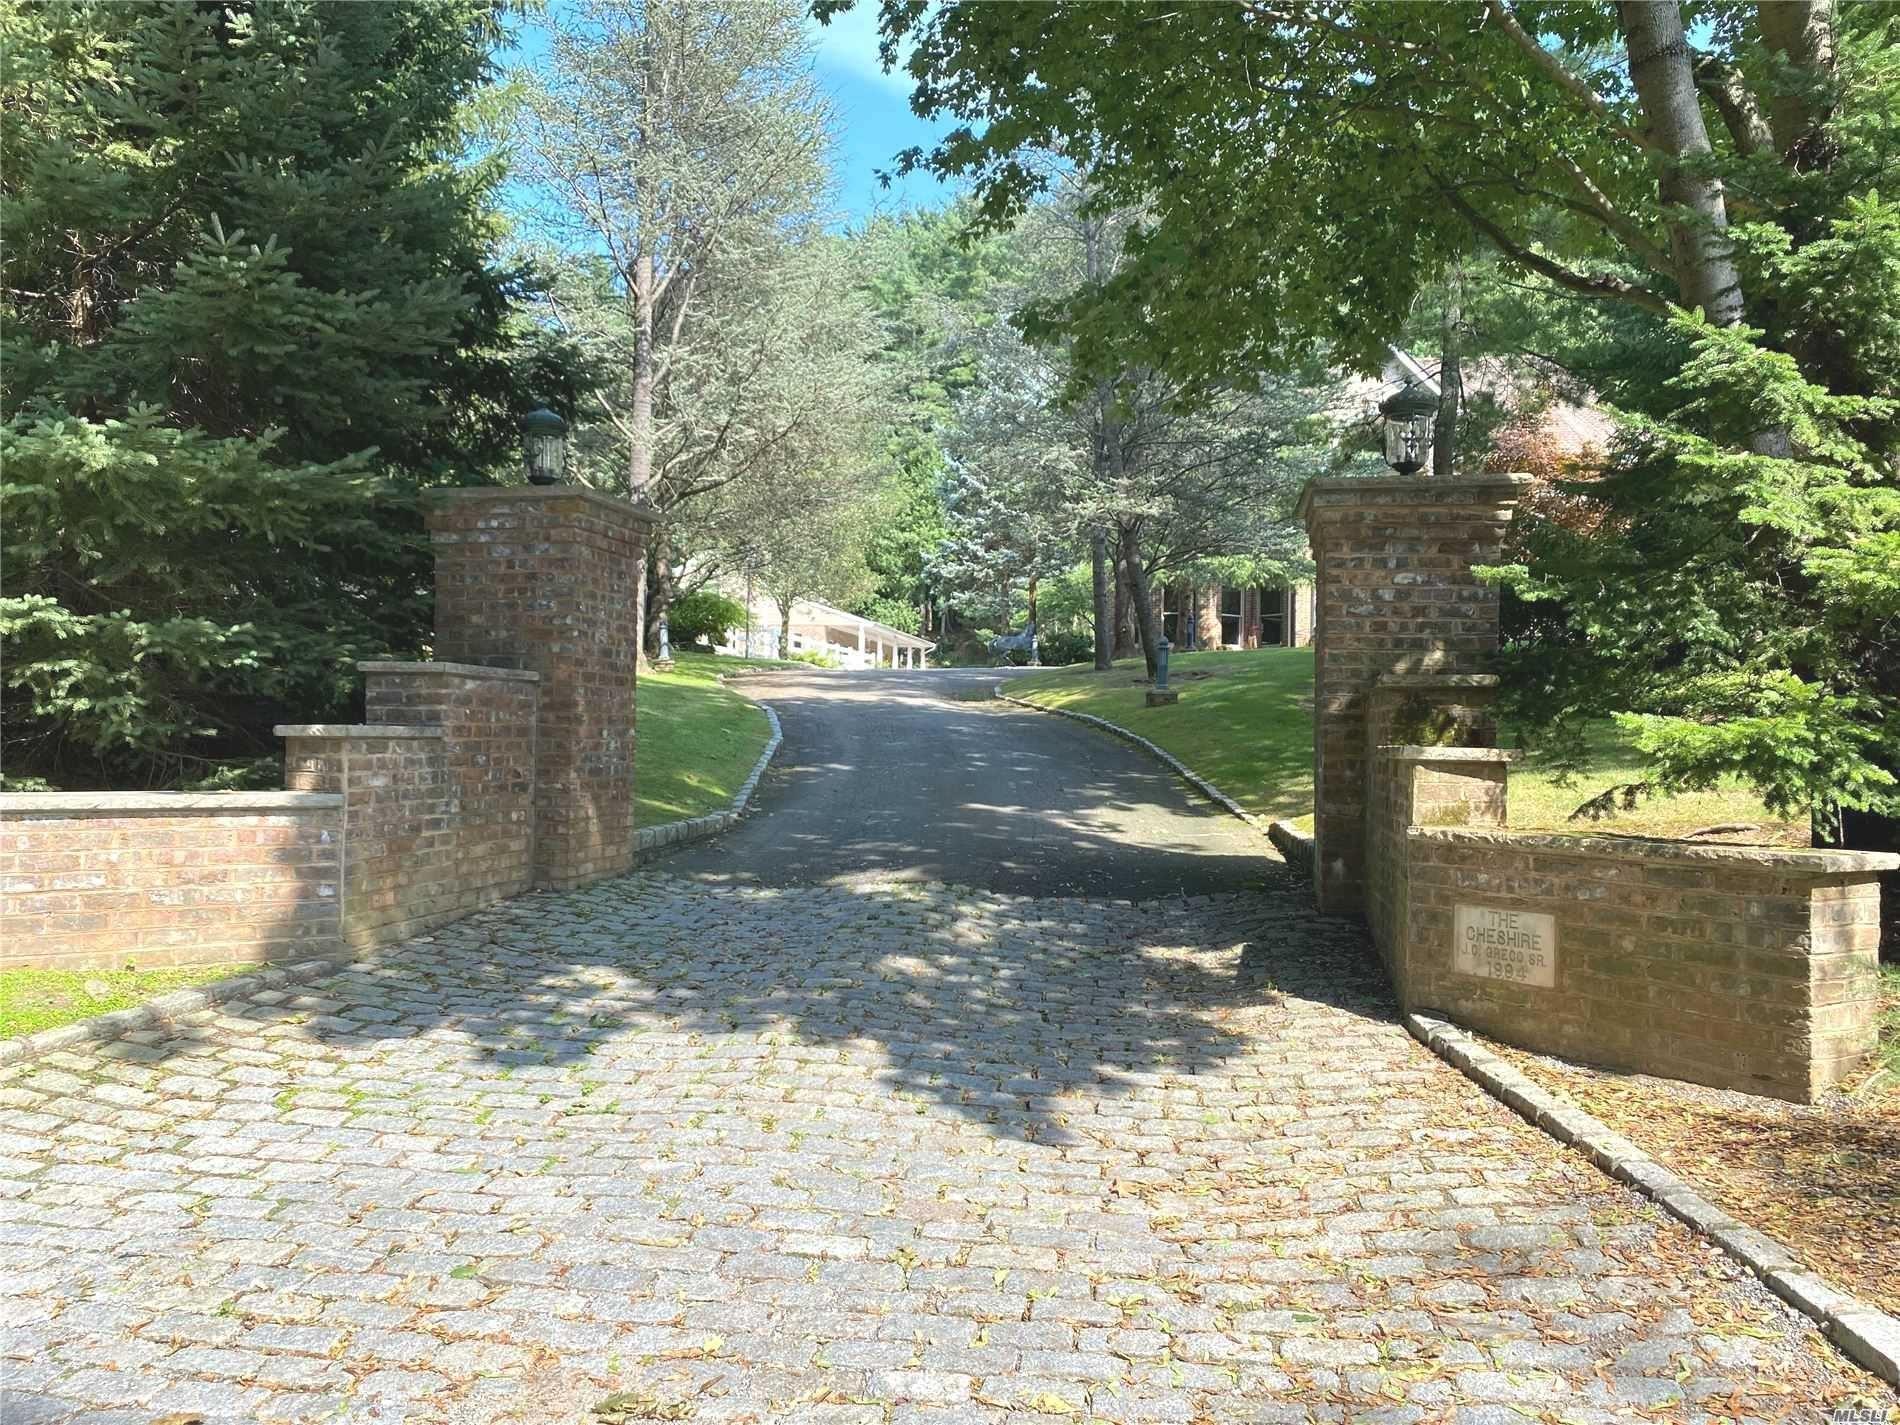 Photo of 99 White Oak Tree Road, Laurel Hollow, NY 11791 (MLS # 3201196)